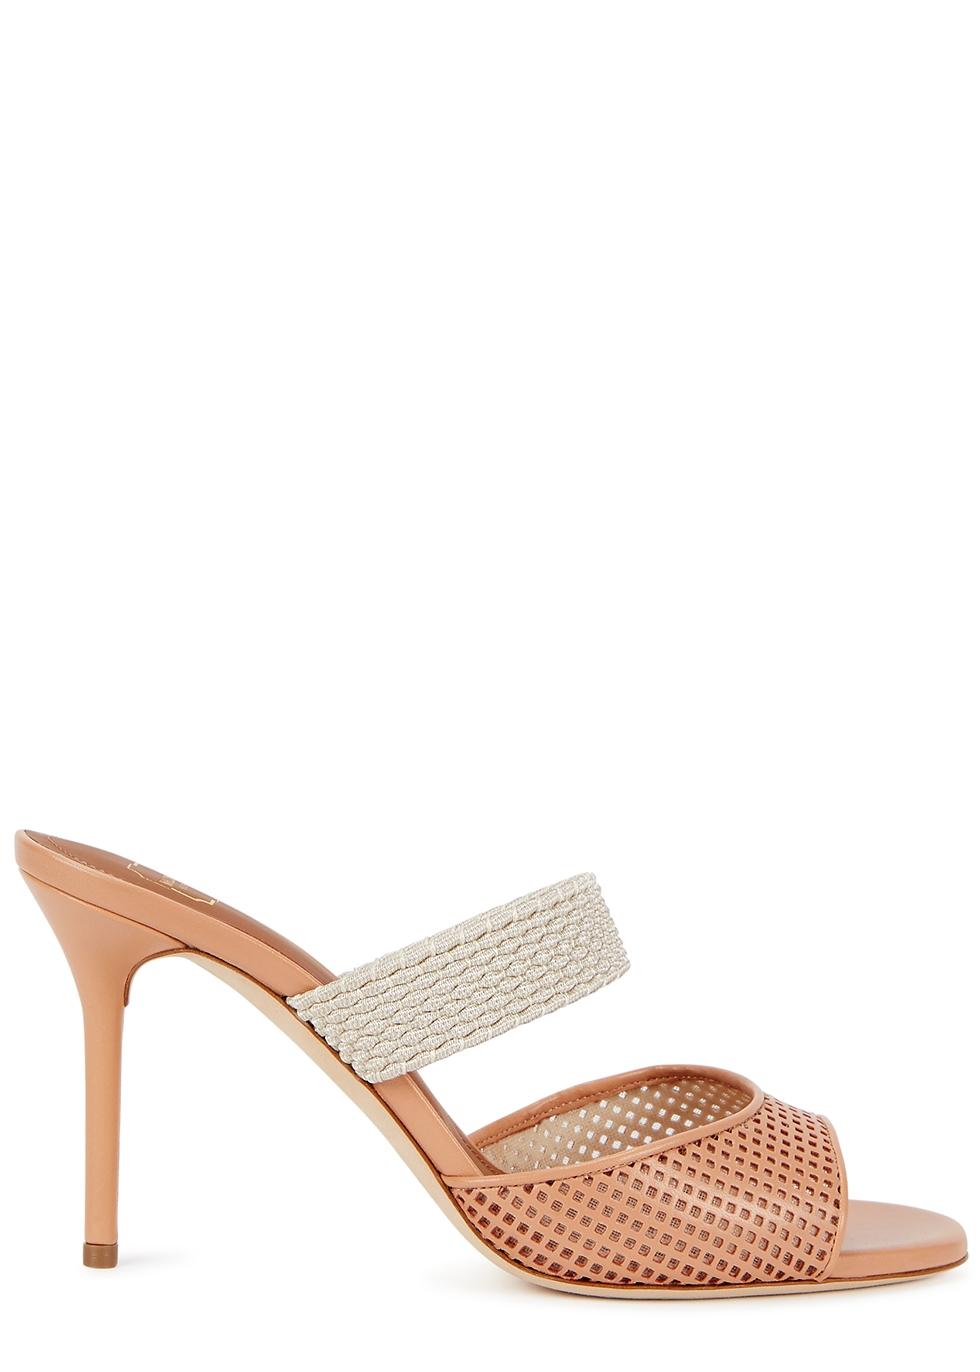 Milena 85 blush leather sandals